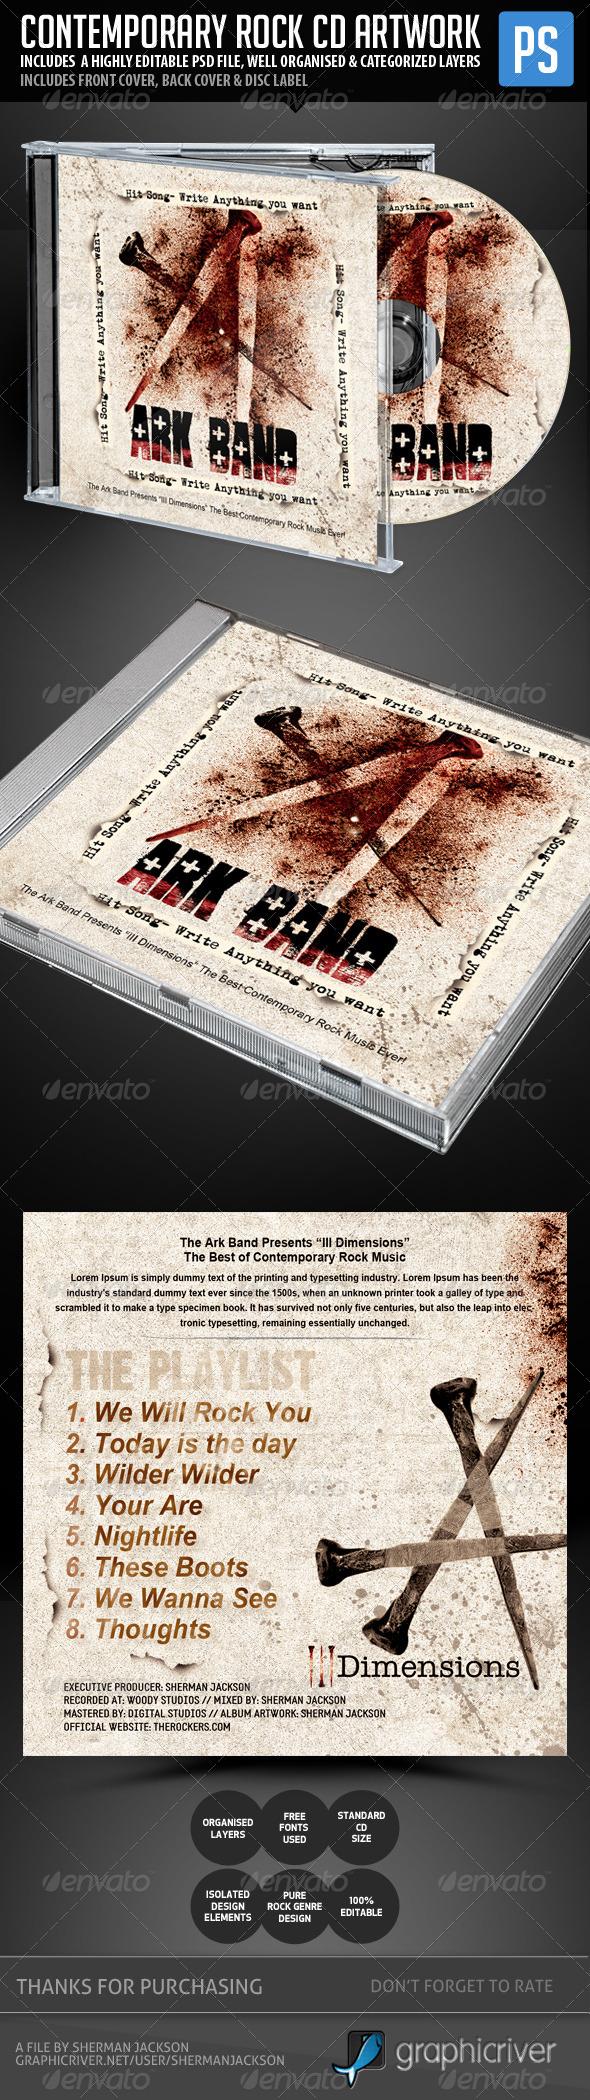 Contemporary Rock CD Artwork Template - CD & DVD Artwork Print Templates